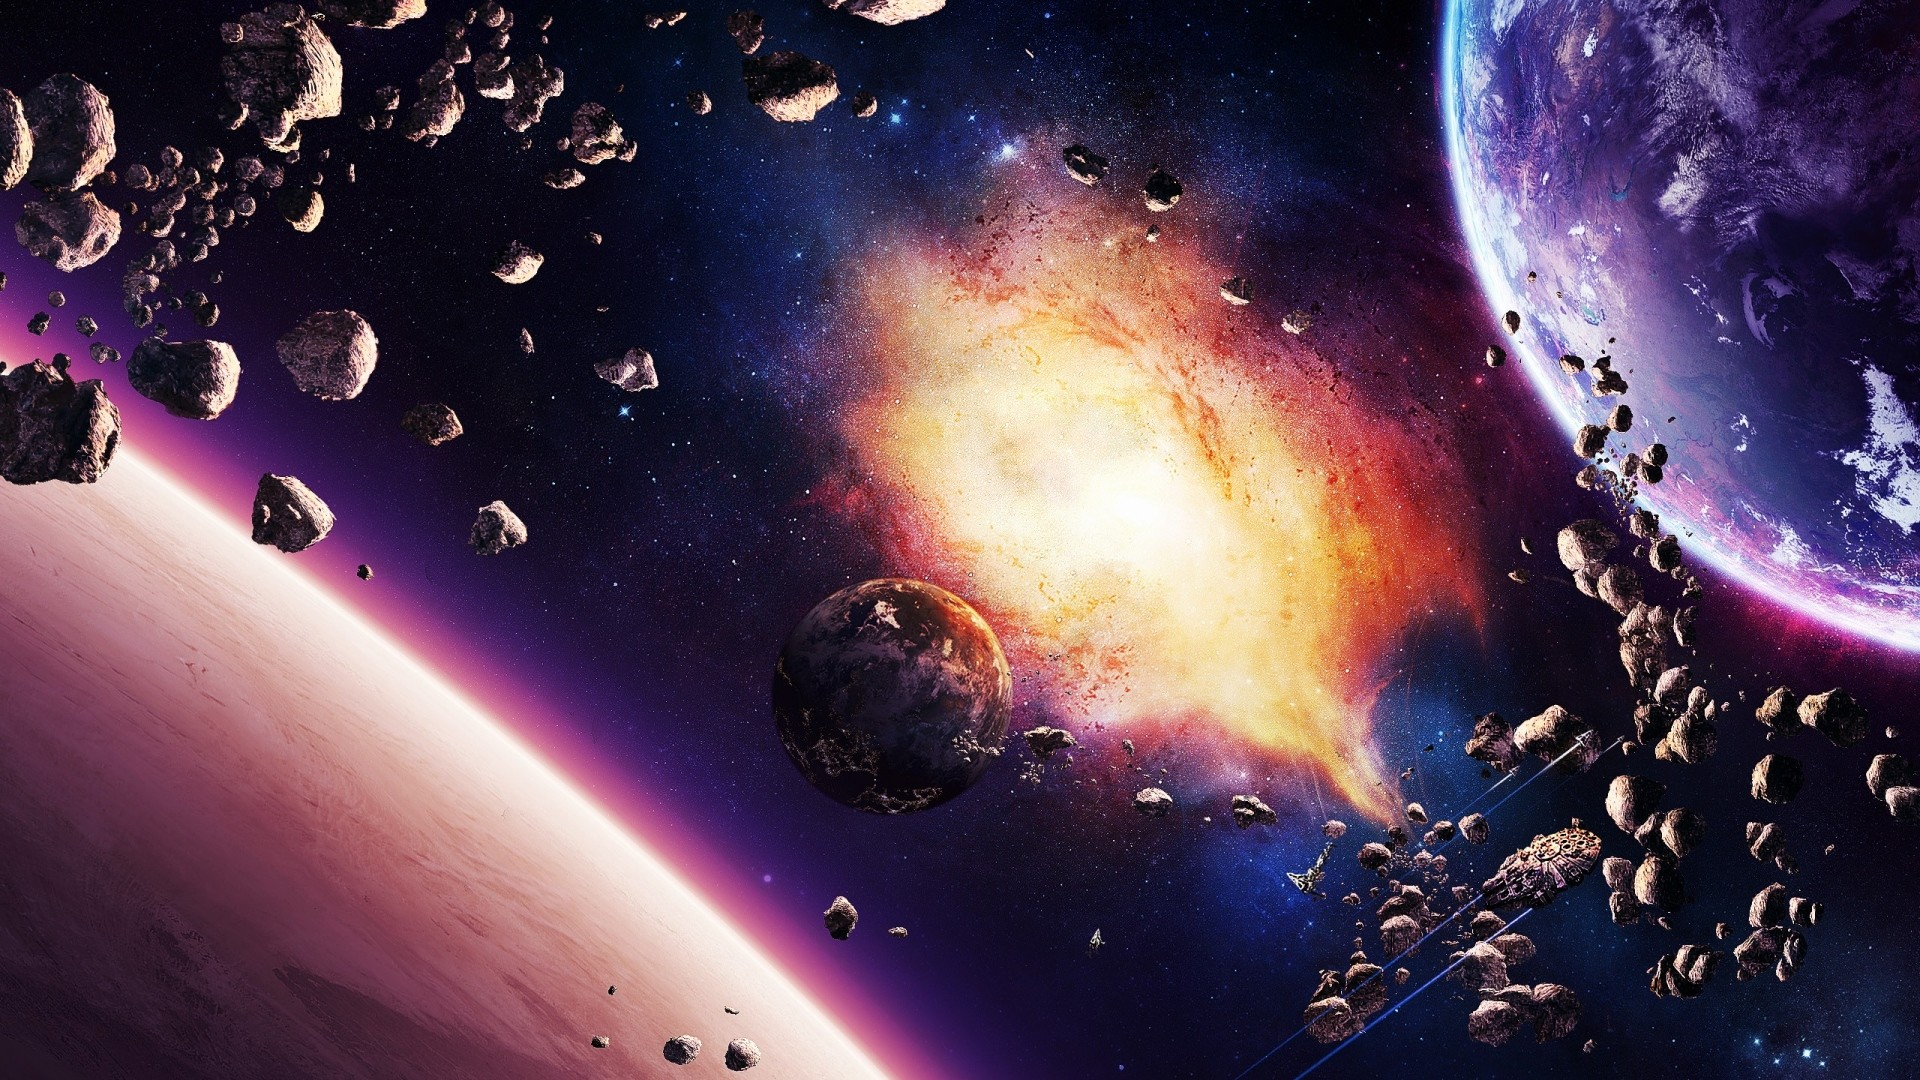 Wallpaper space, planet, explosion, light